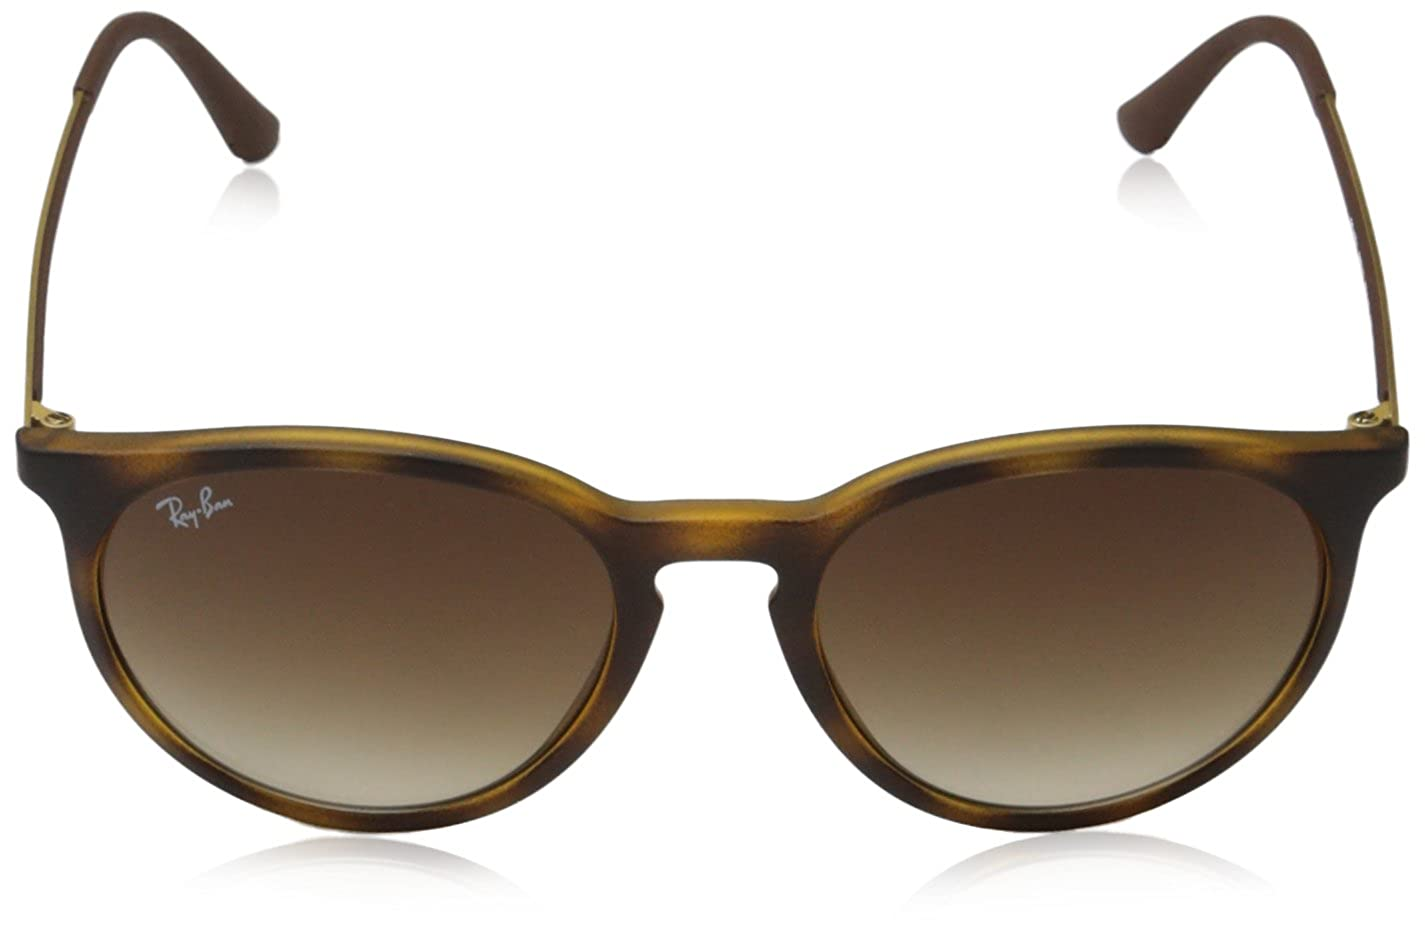 bc3c526b3f1 Ray-Ban Unisex s 4274 Sunglasses